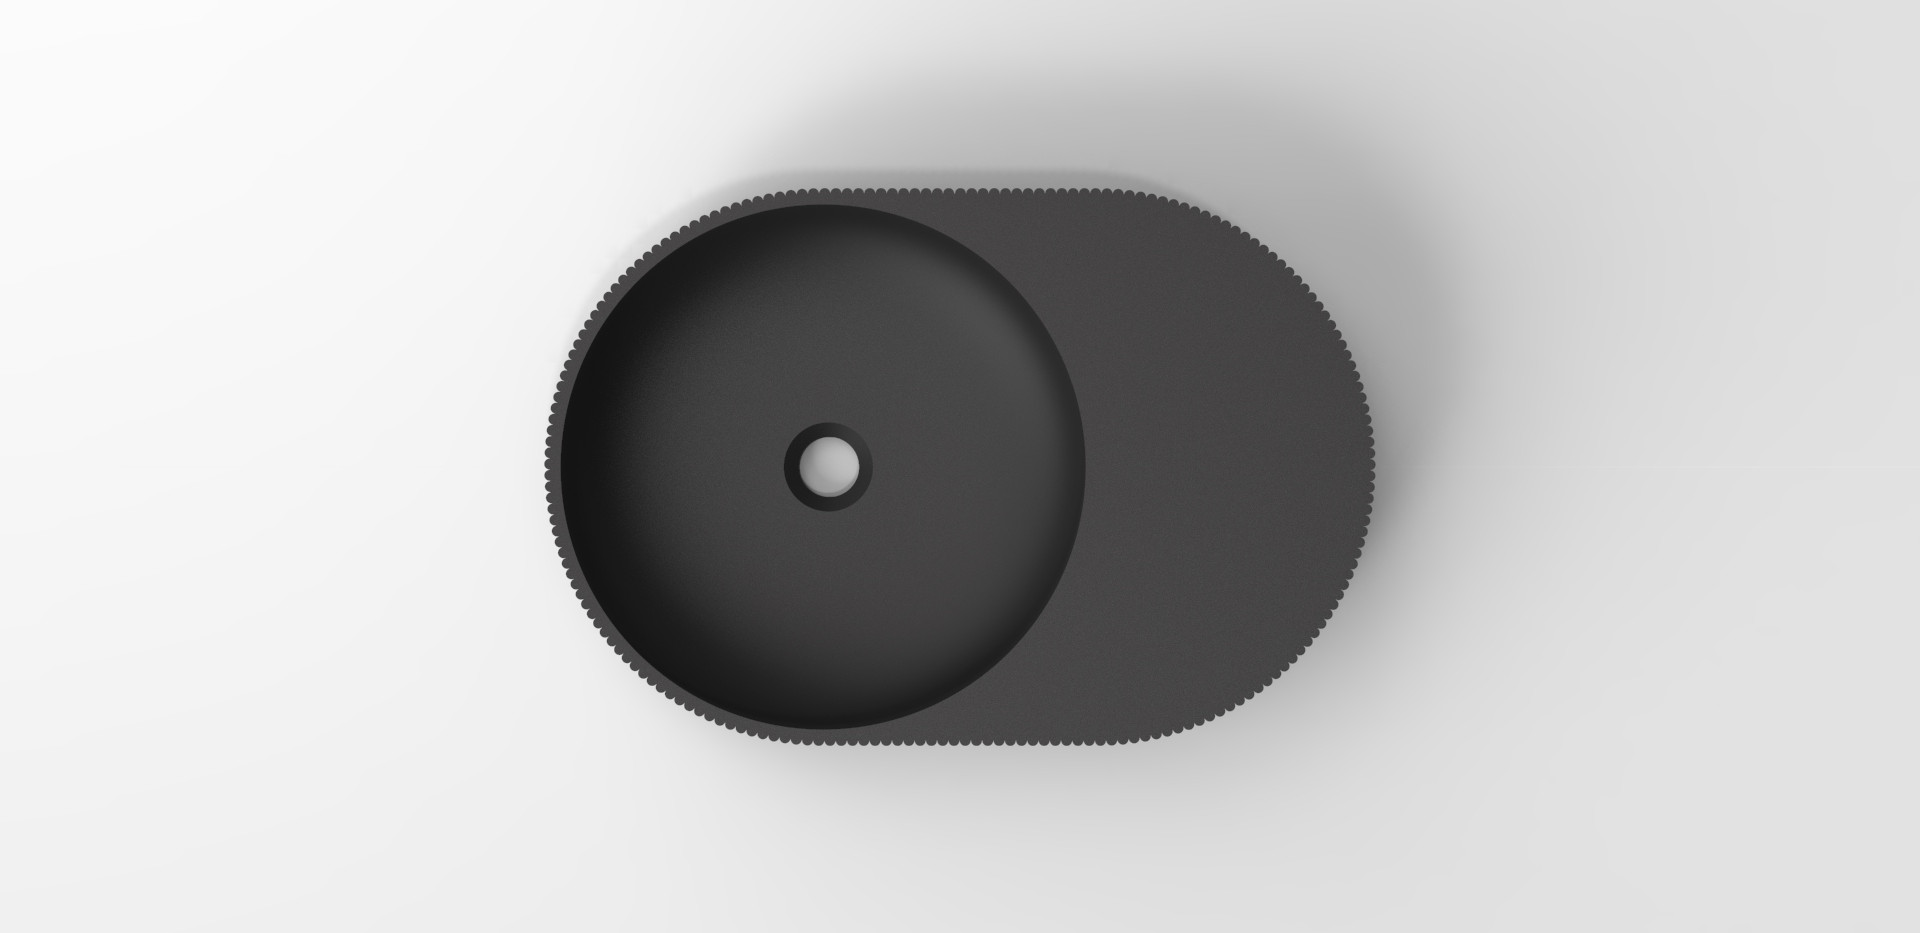 C-01 Charcoal Black top.jpg